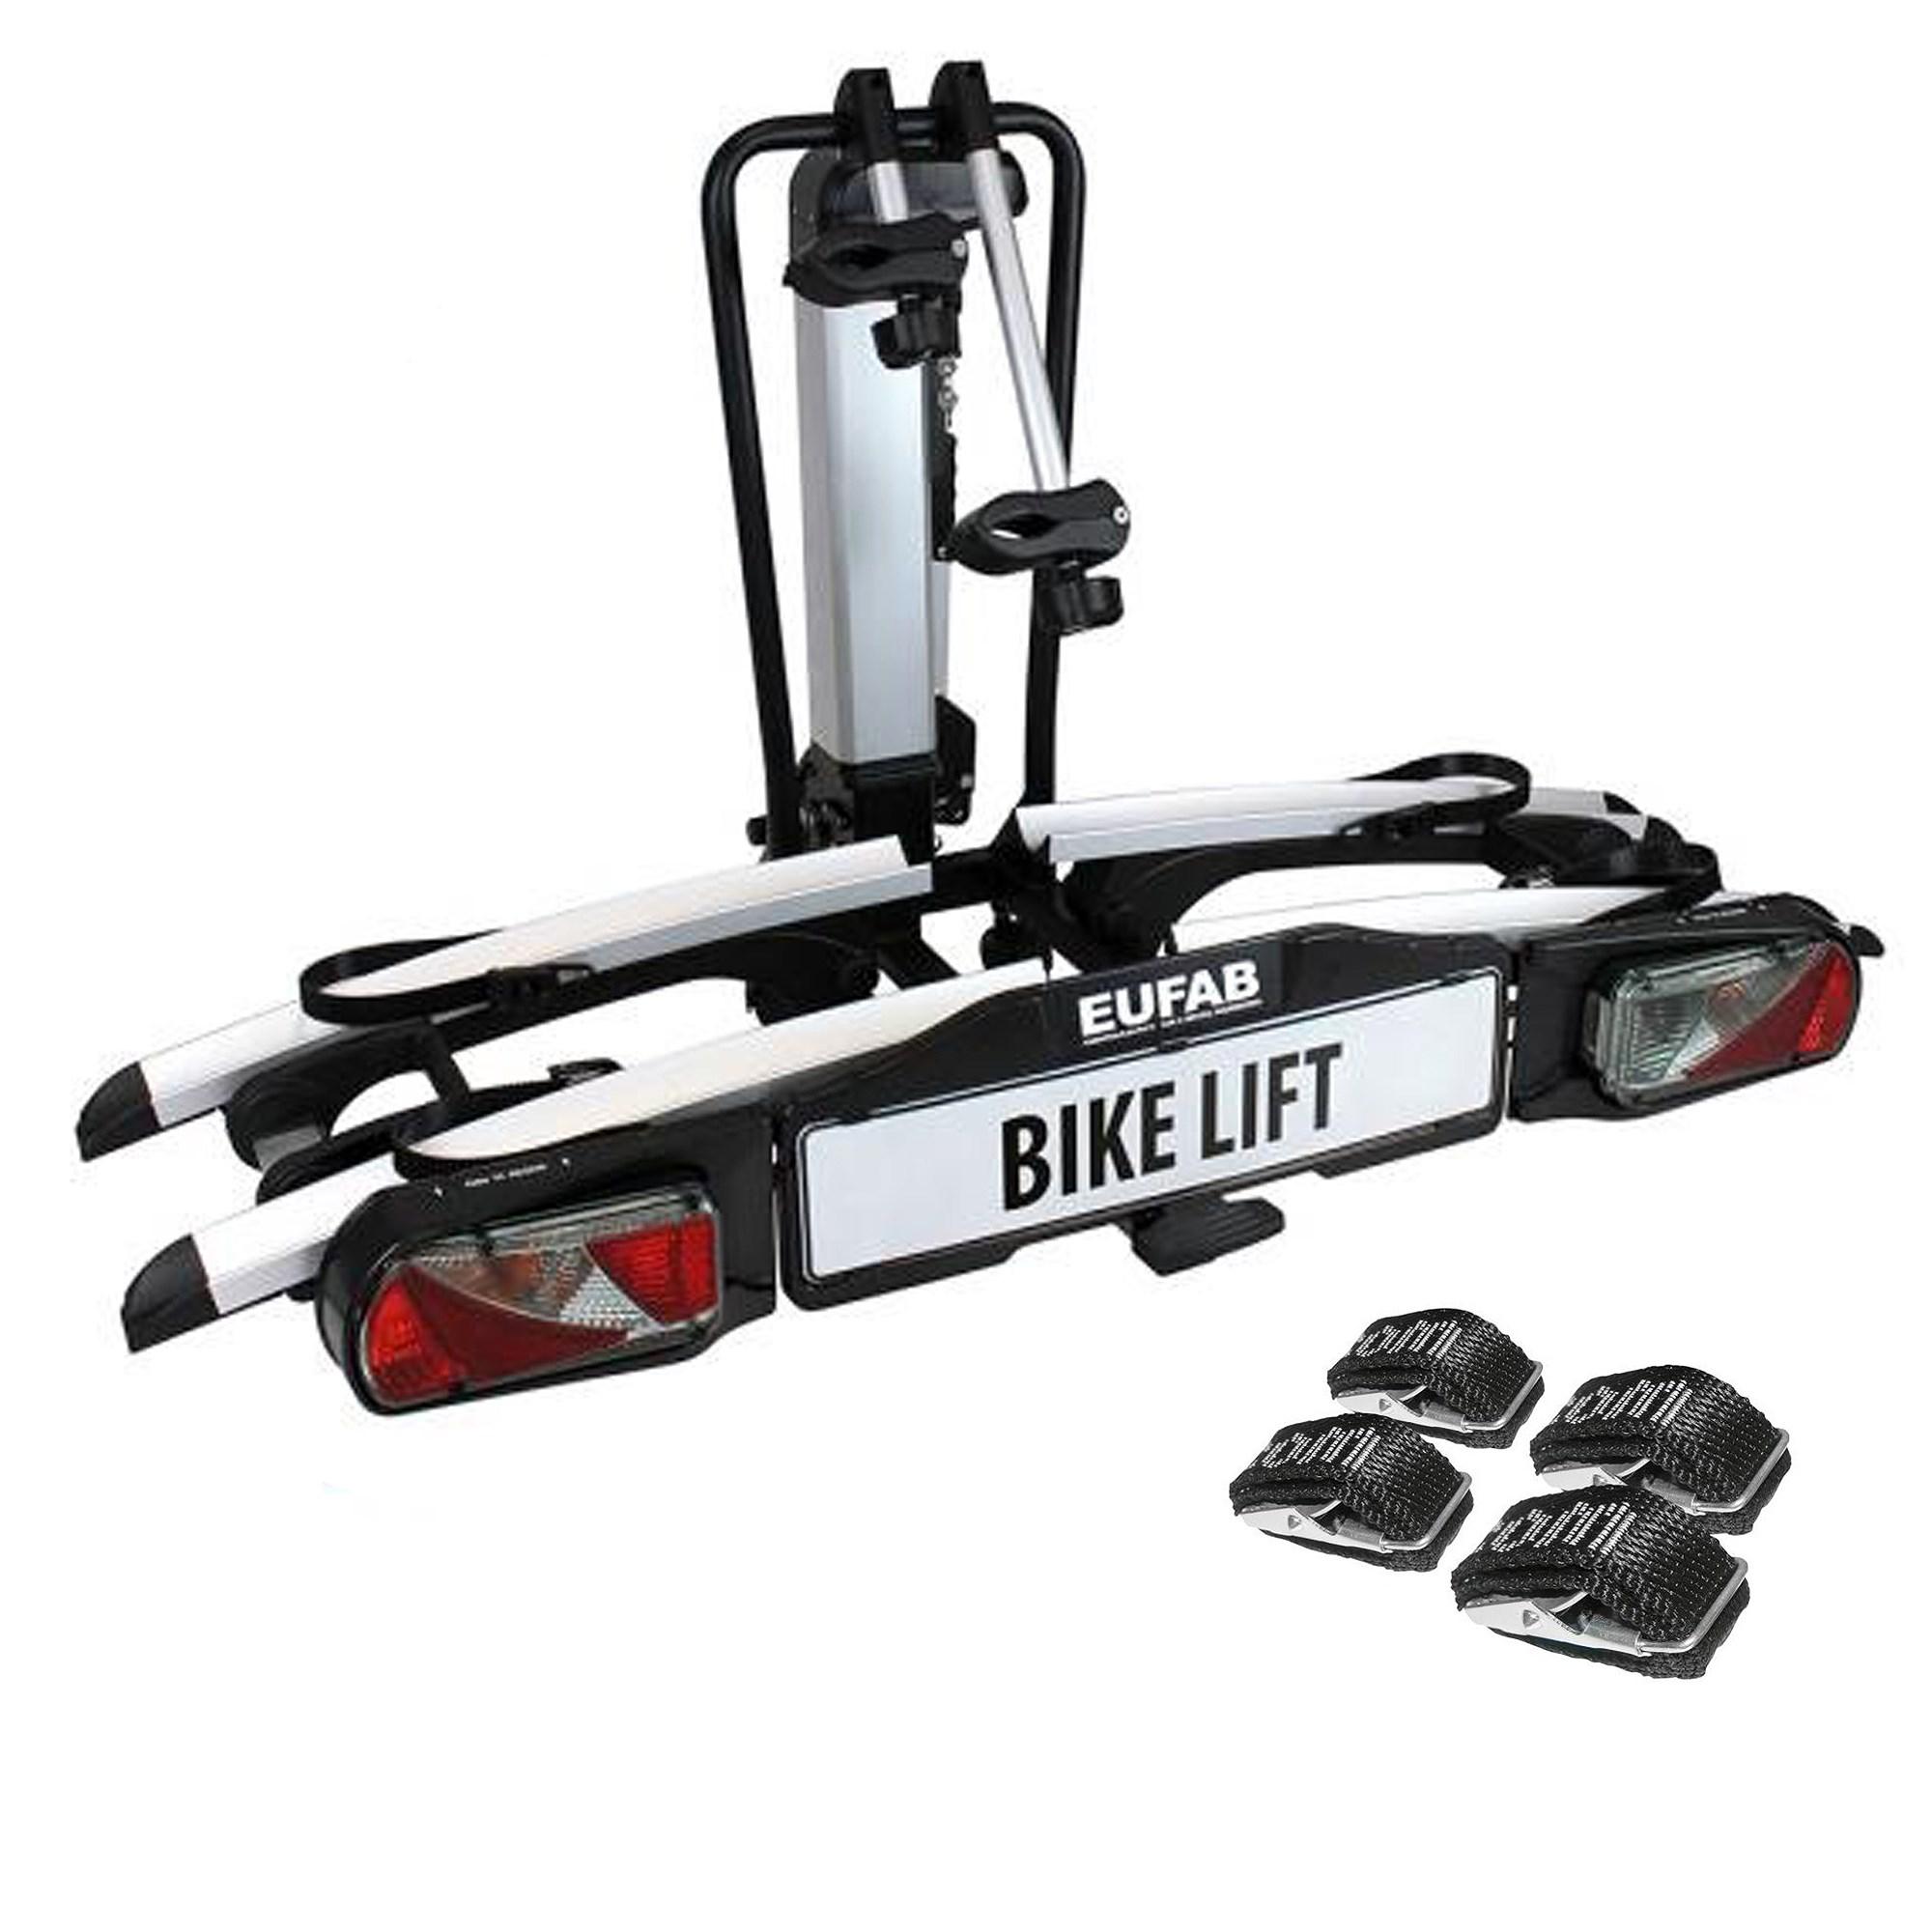 eufab bikelift fahrradtr ger ahk textilspanngurte atp. Black Bedroom Furniture Sets. Home Design Ideas